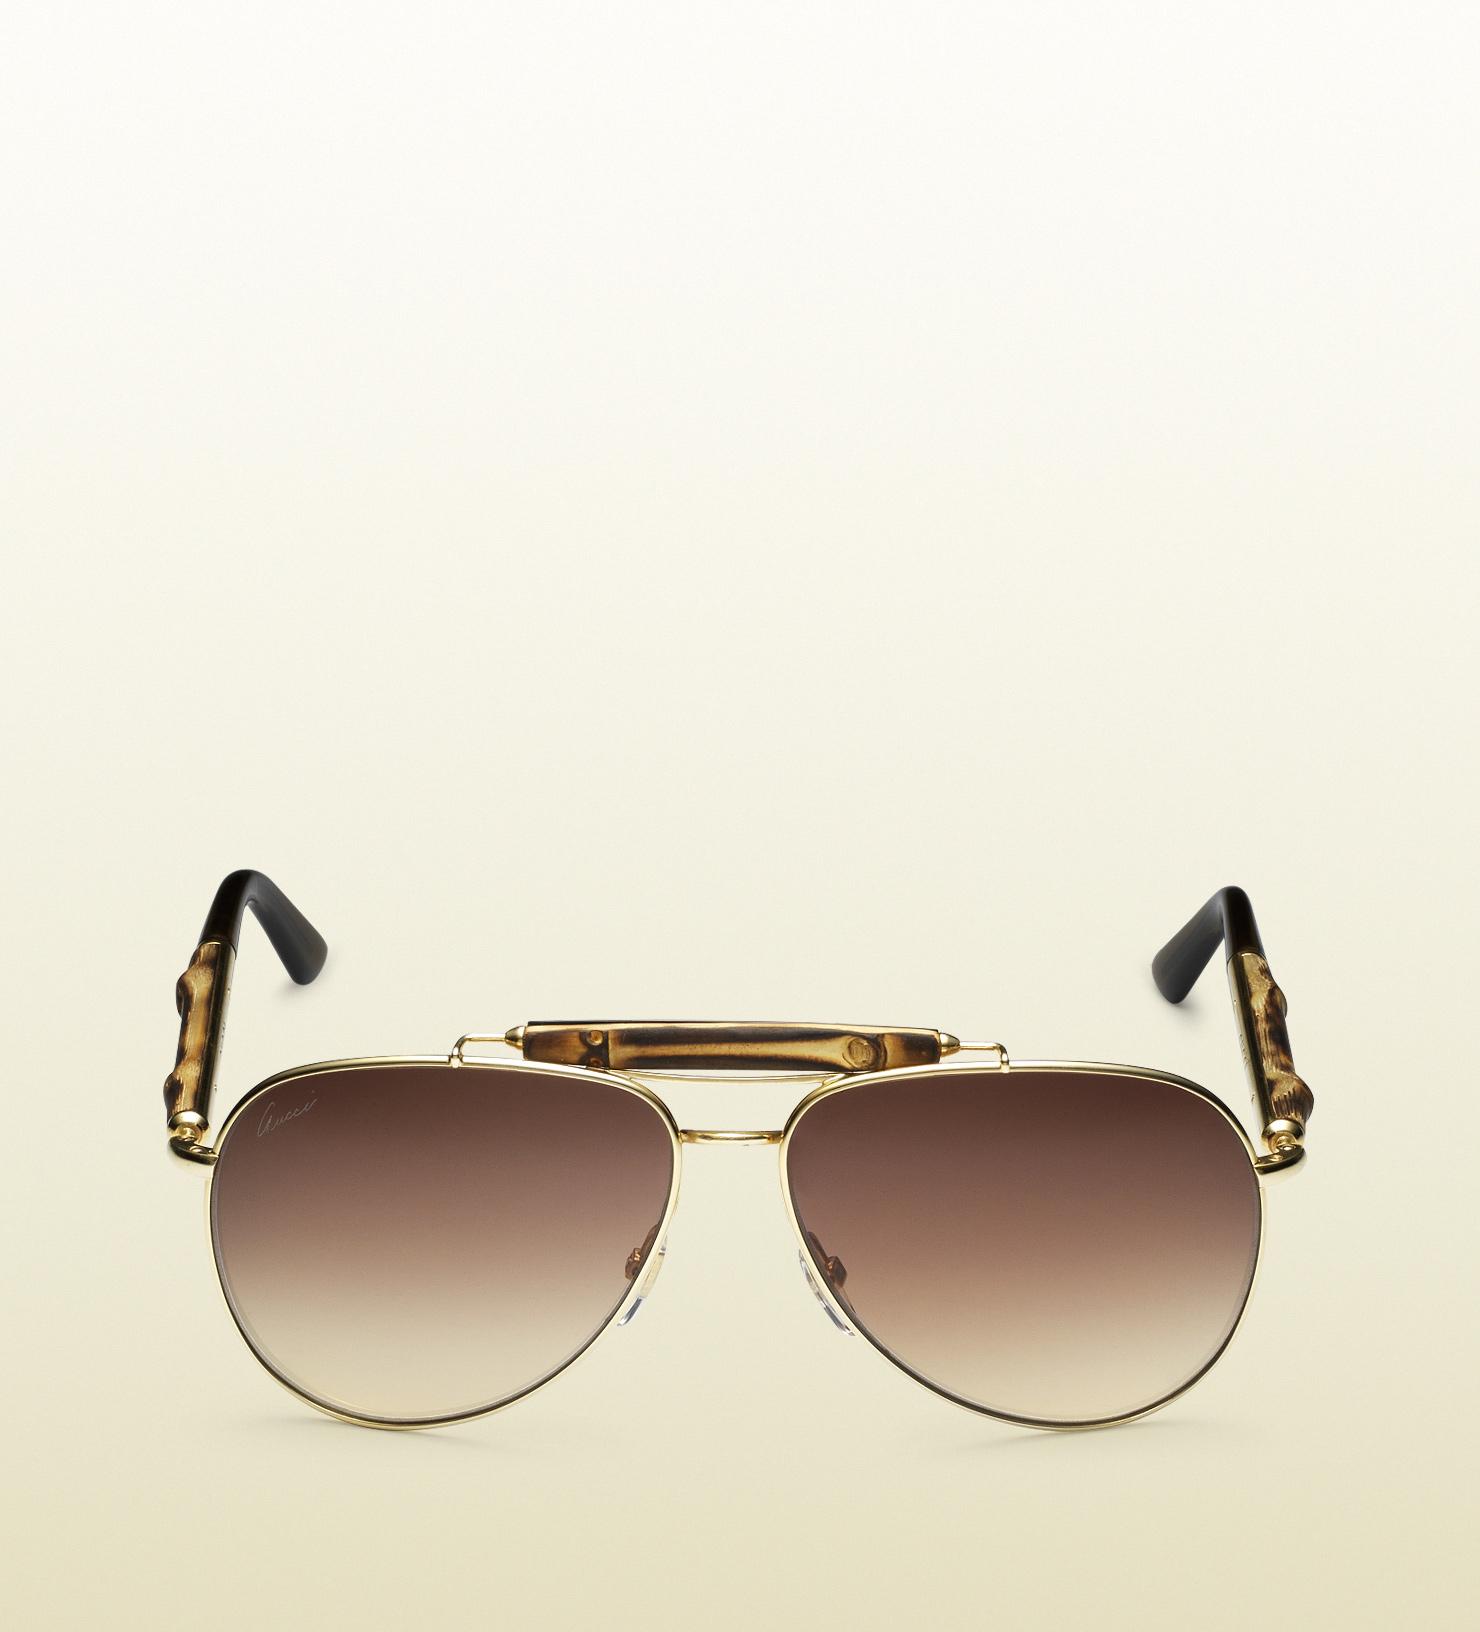 Gucci Bamboo Aviator Sunglasses In Brown Lyst